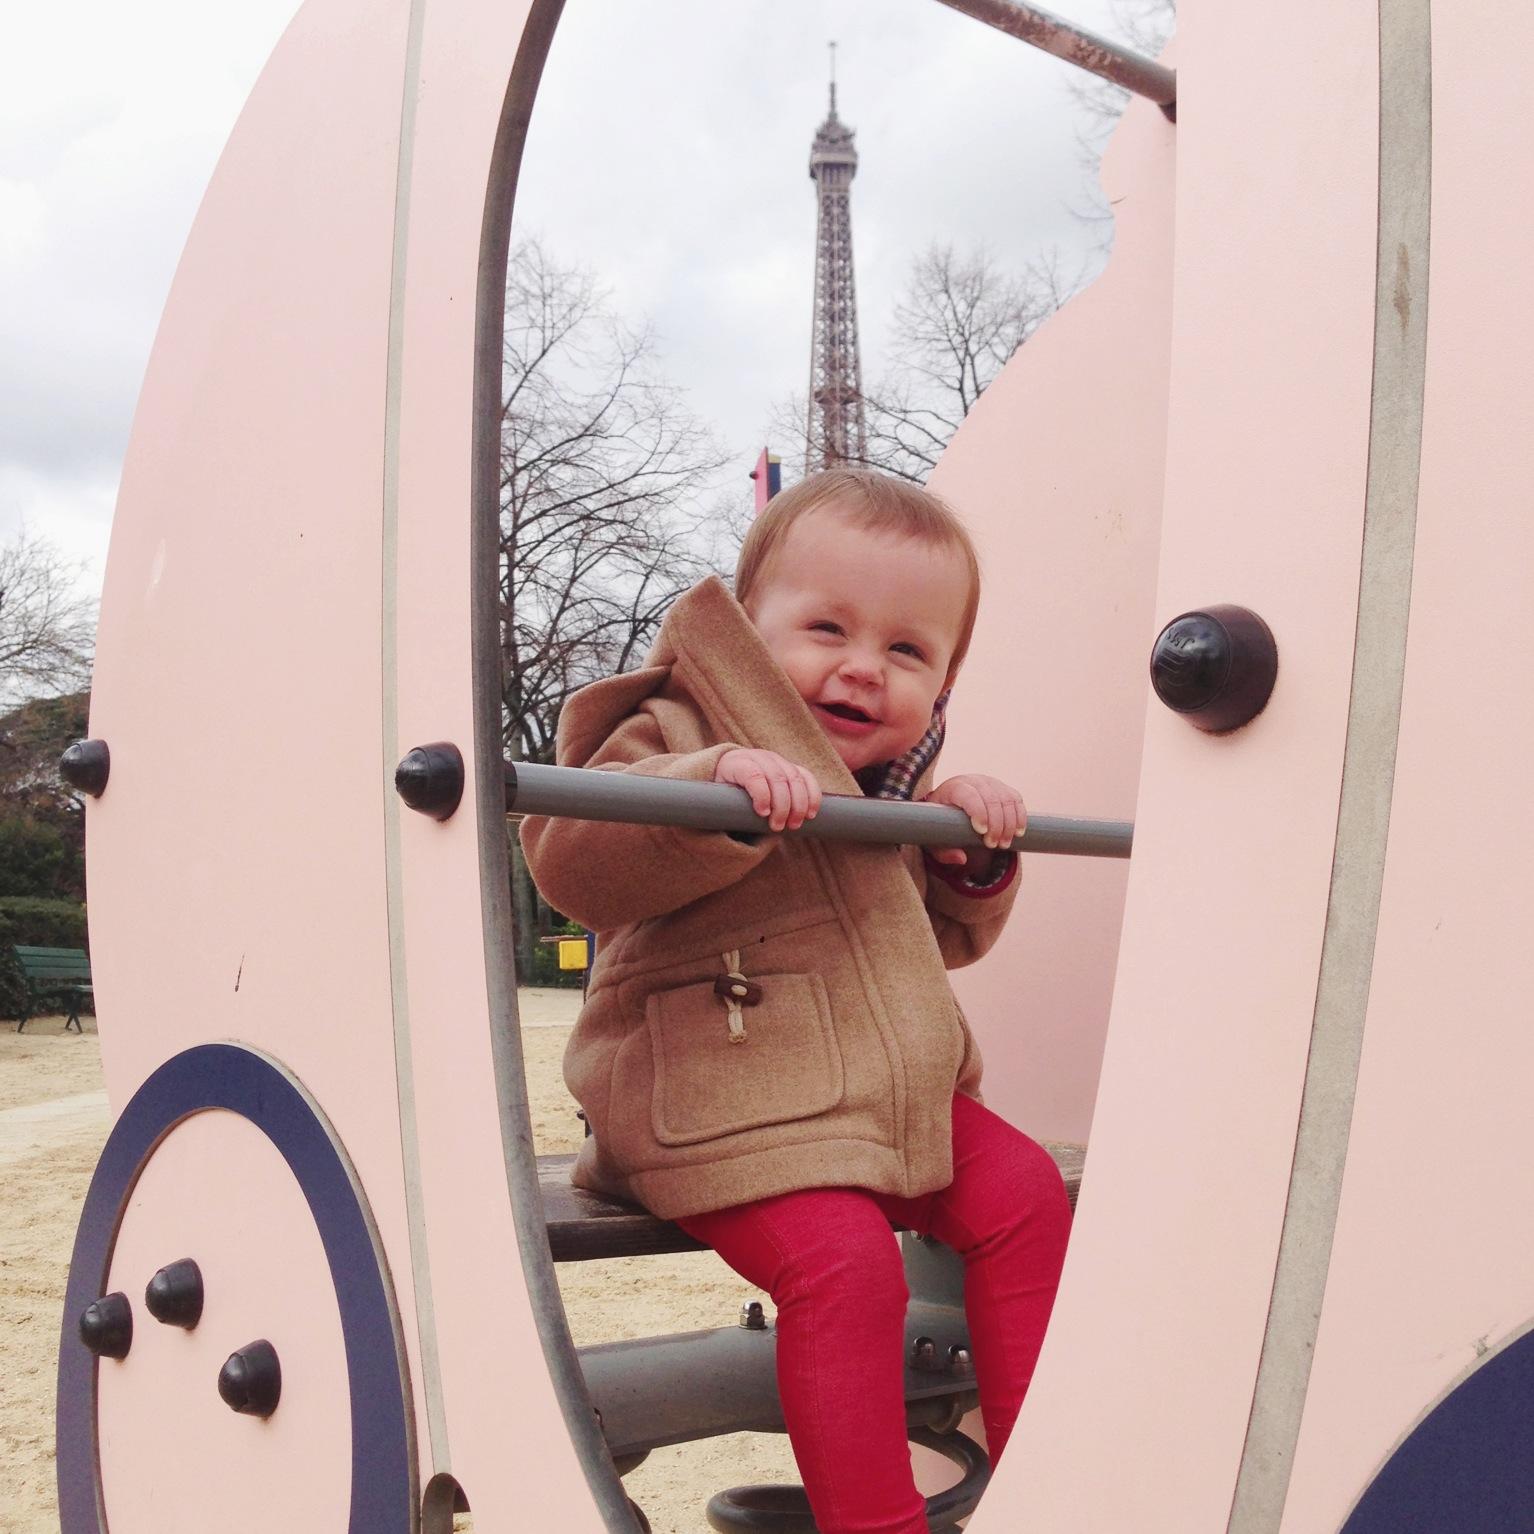 parisian_playgrounds_for_kids_aspiring_kennedy_eiffel_tower